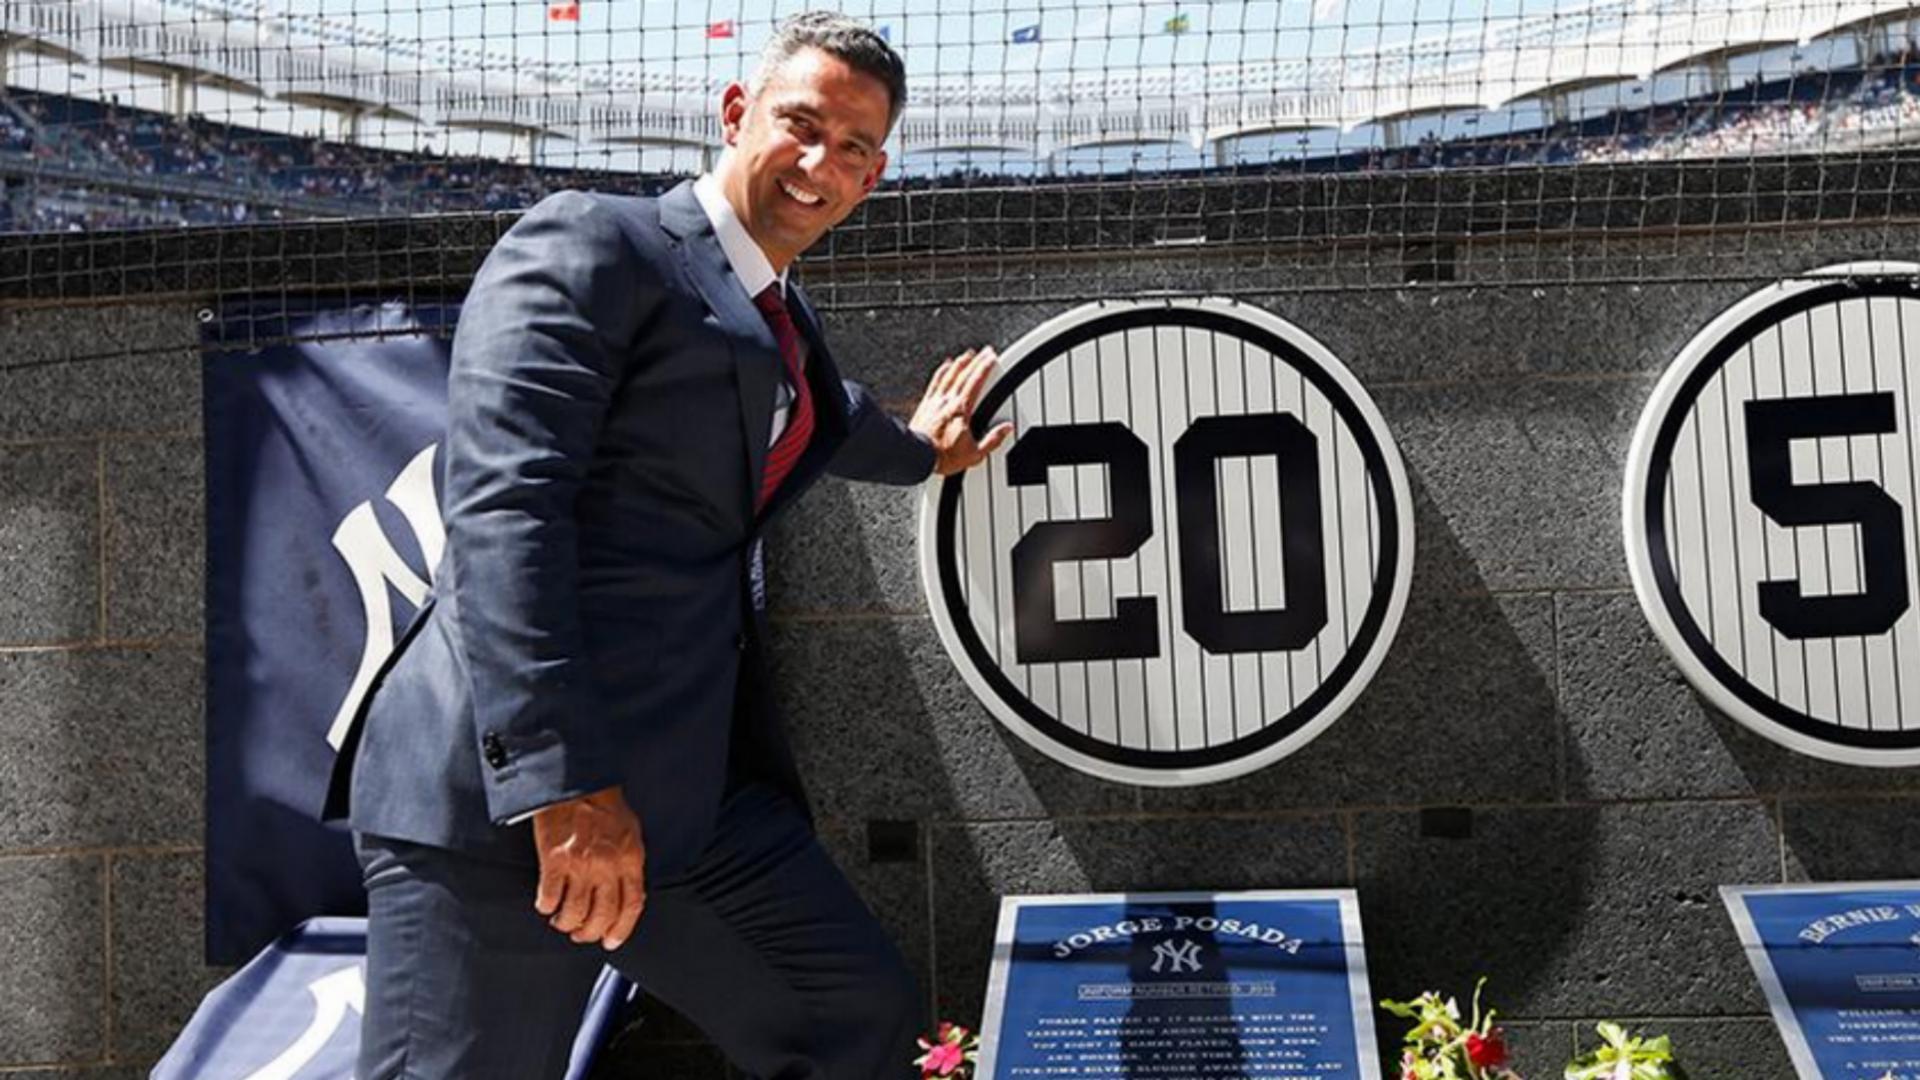 Yankees Jorge Posada Gets Number Retired Plaque In Monument Park New York Yankees Yankees Retired Numbers New York Yankees Baseball